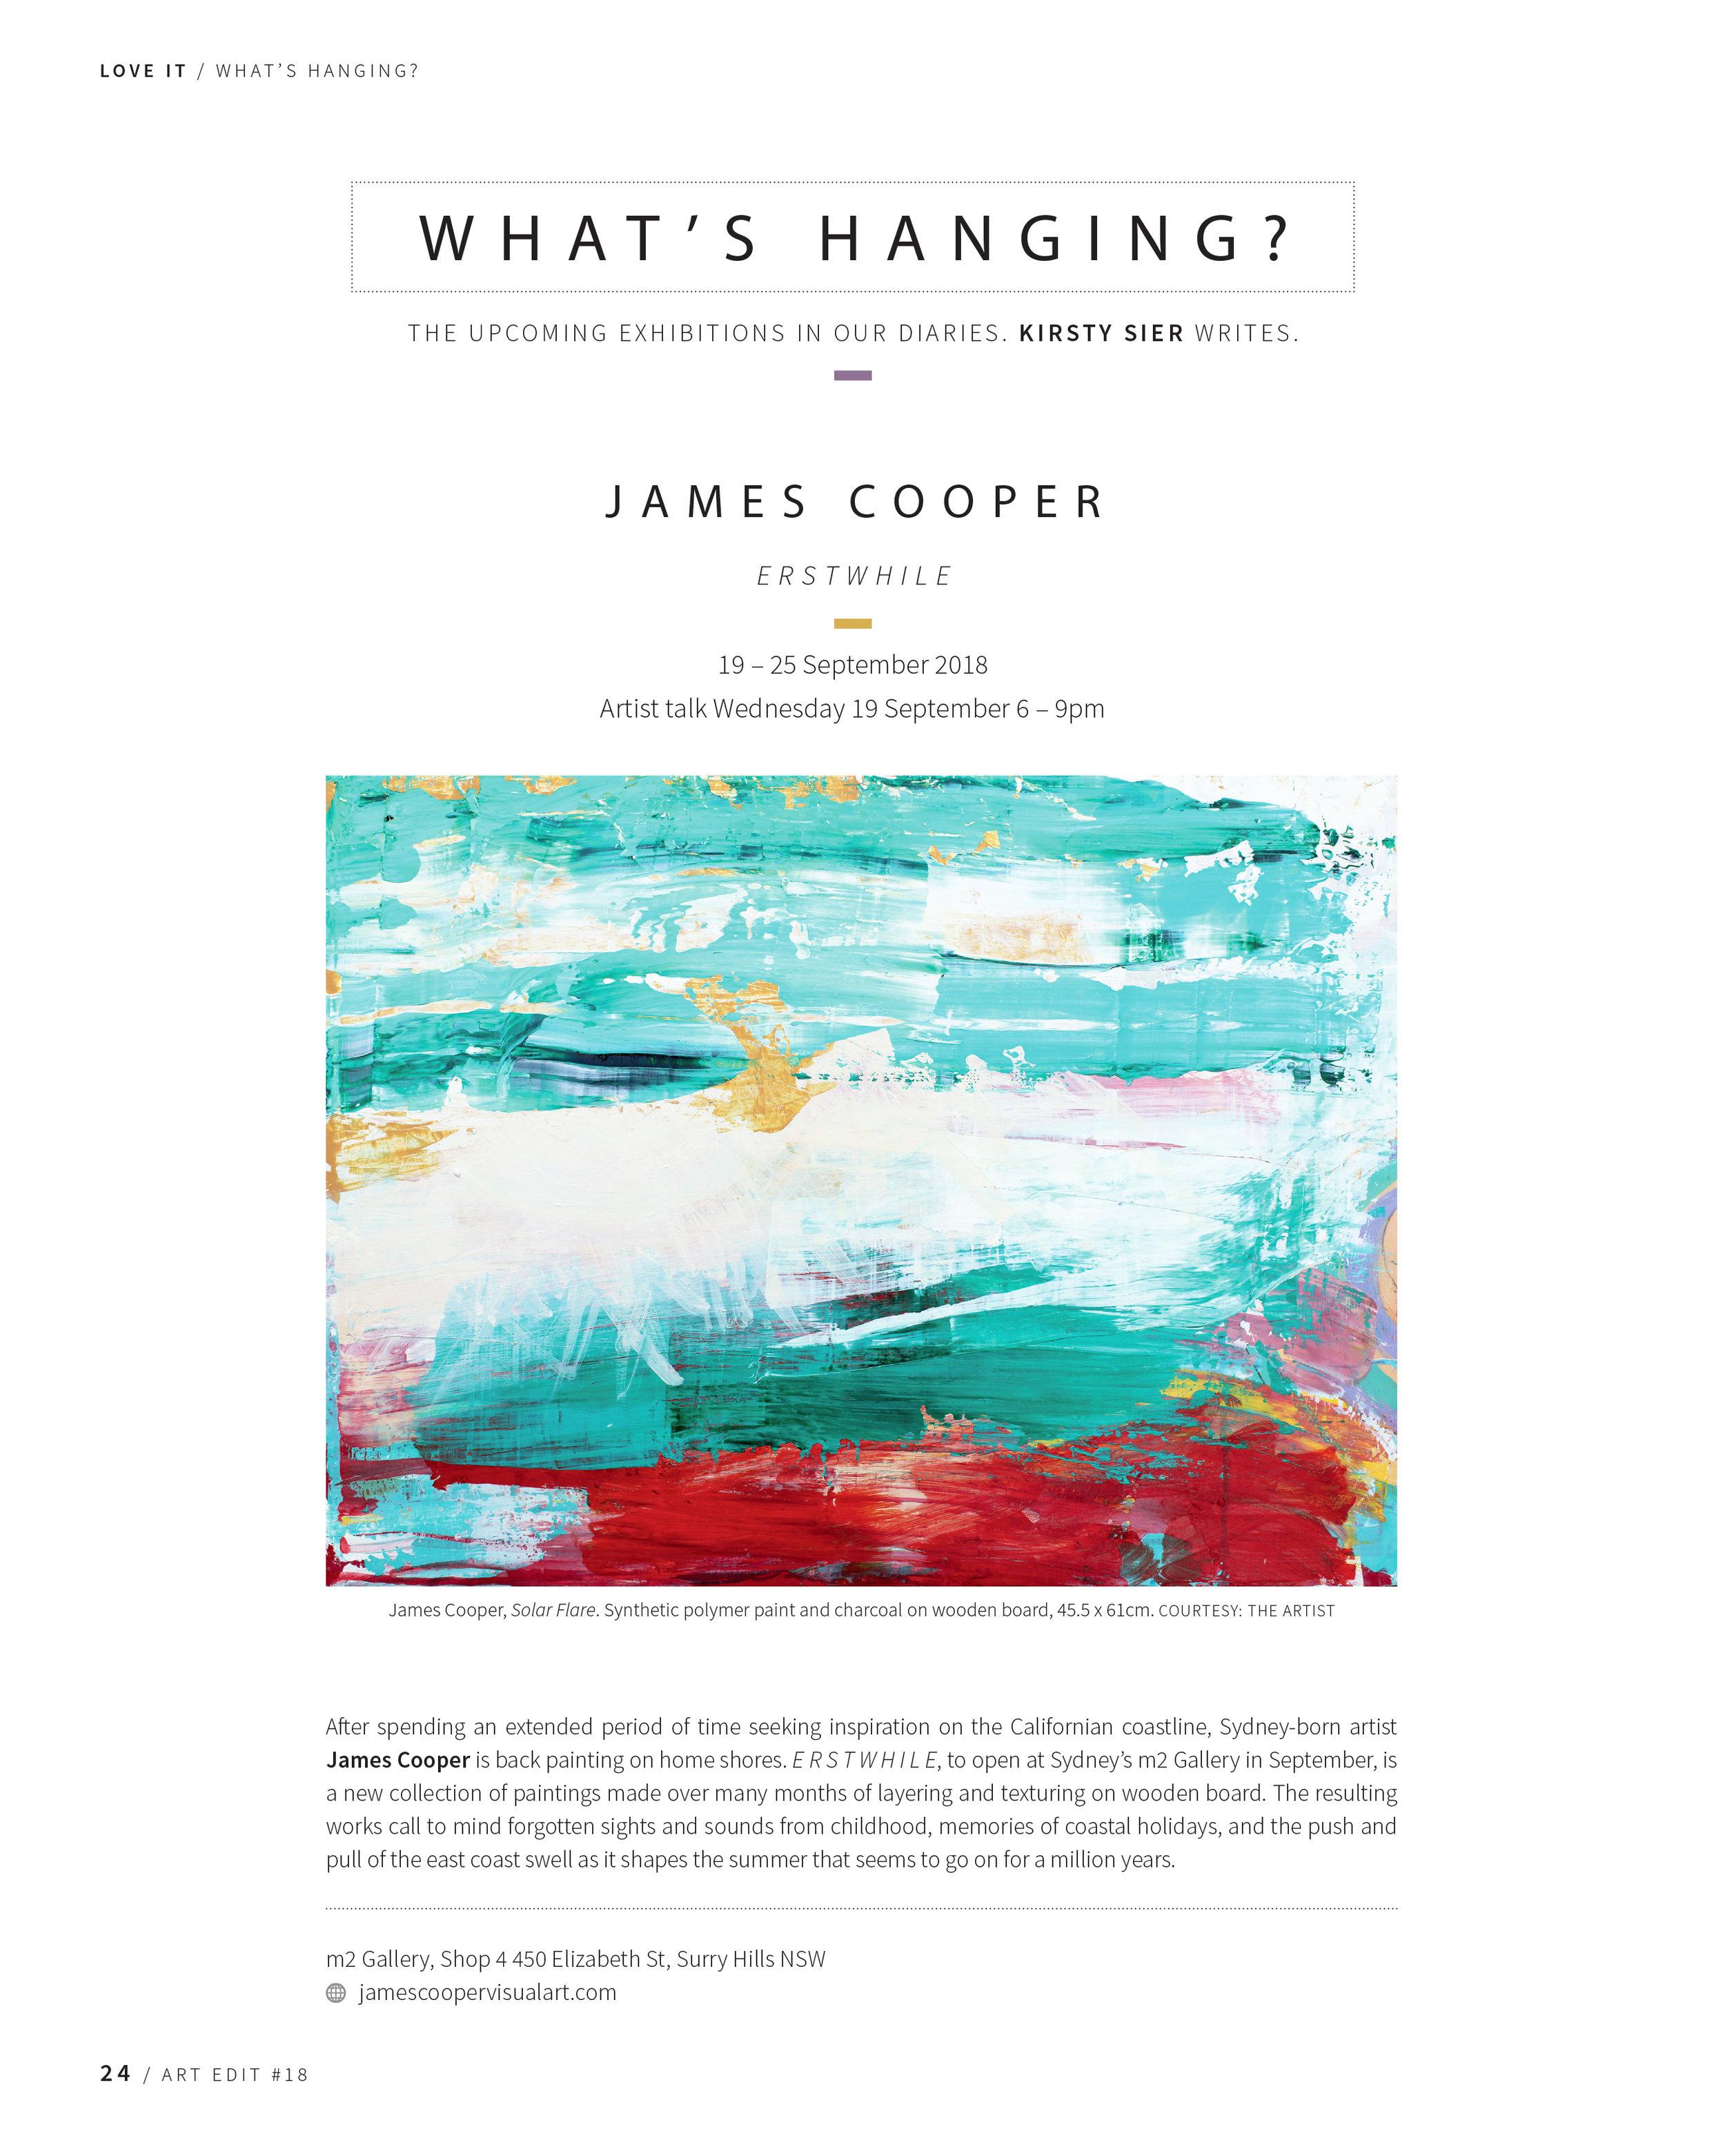 ArtEdit-Magazine-Erstwhile-Whats-Hanging-James-Cooper-Artist.jpg